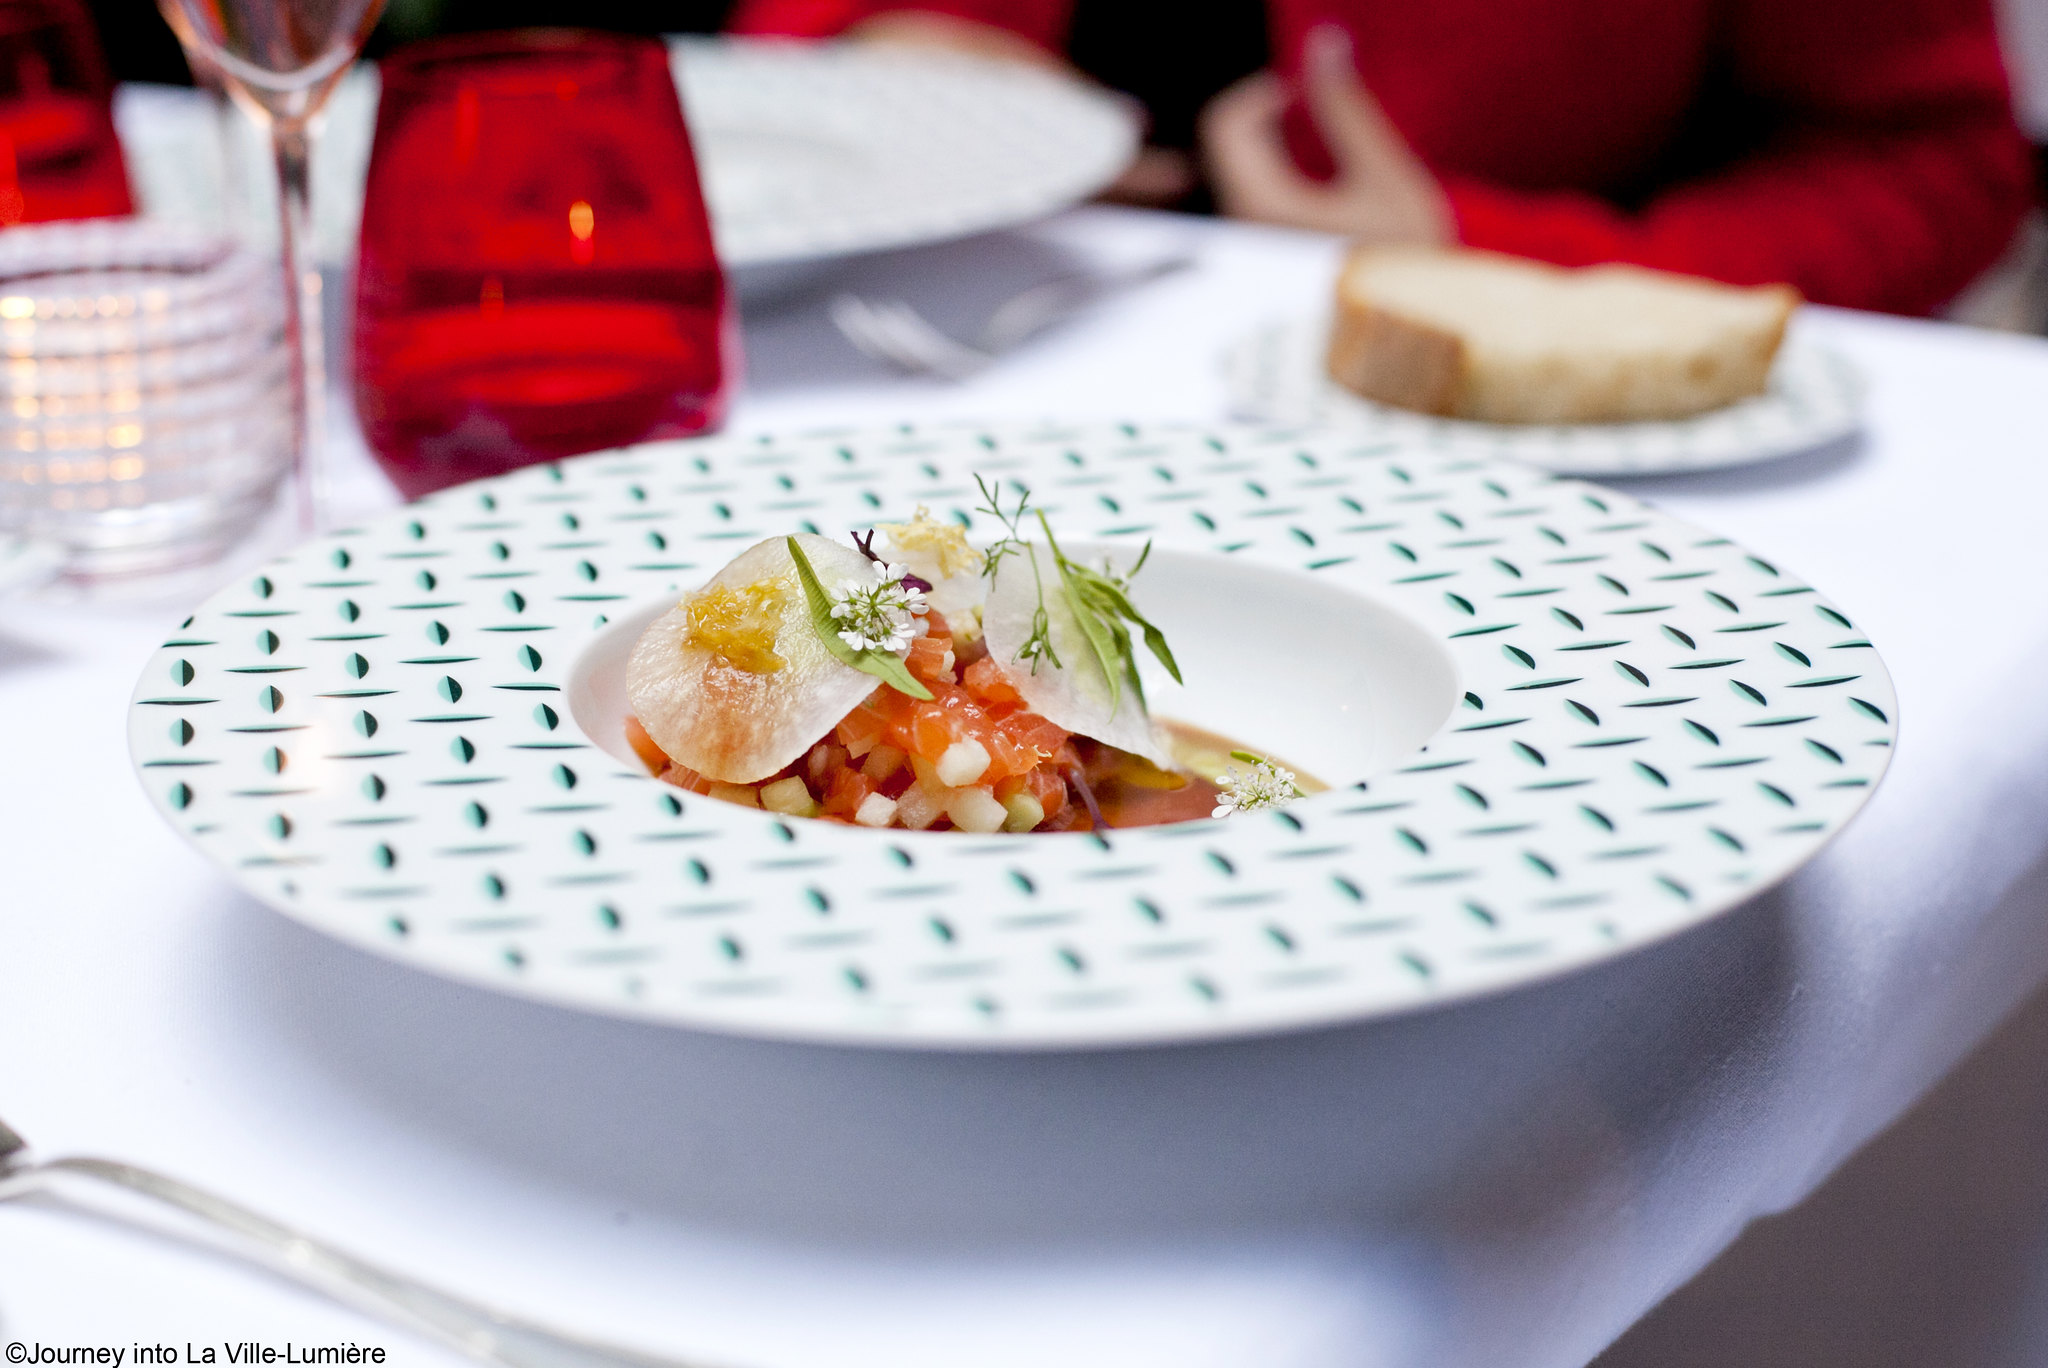 Dinner at La Cour Jardin, Plaza Athénée